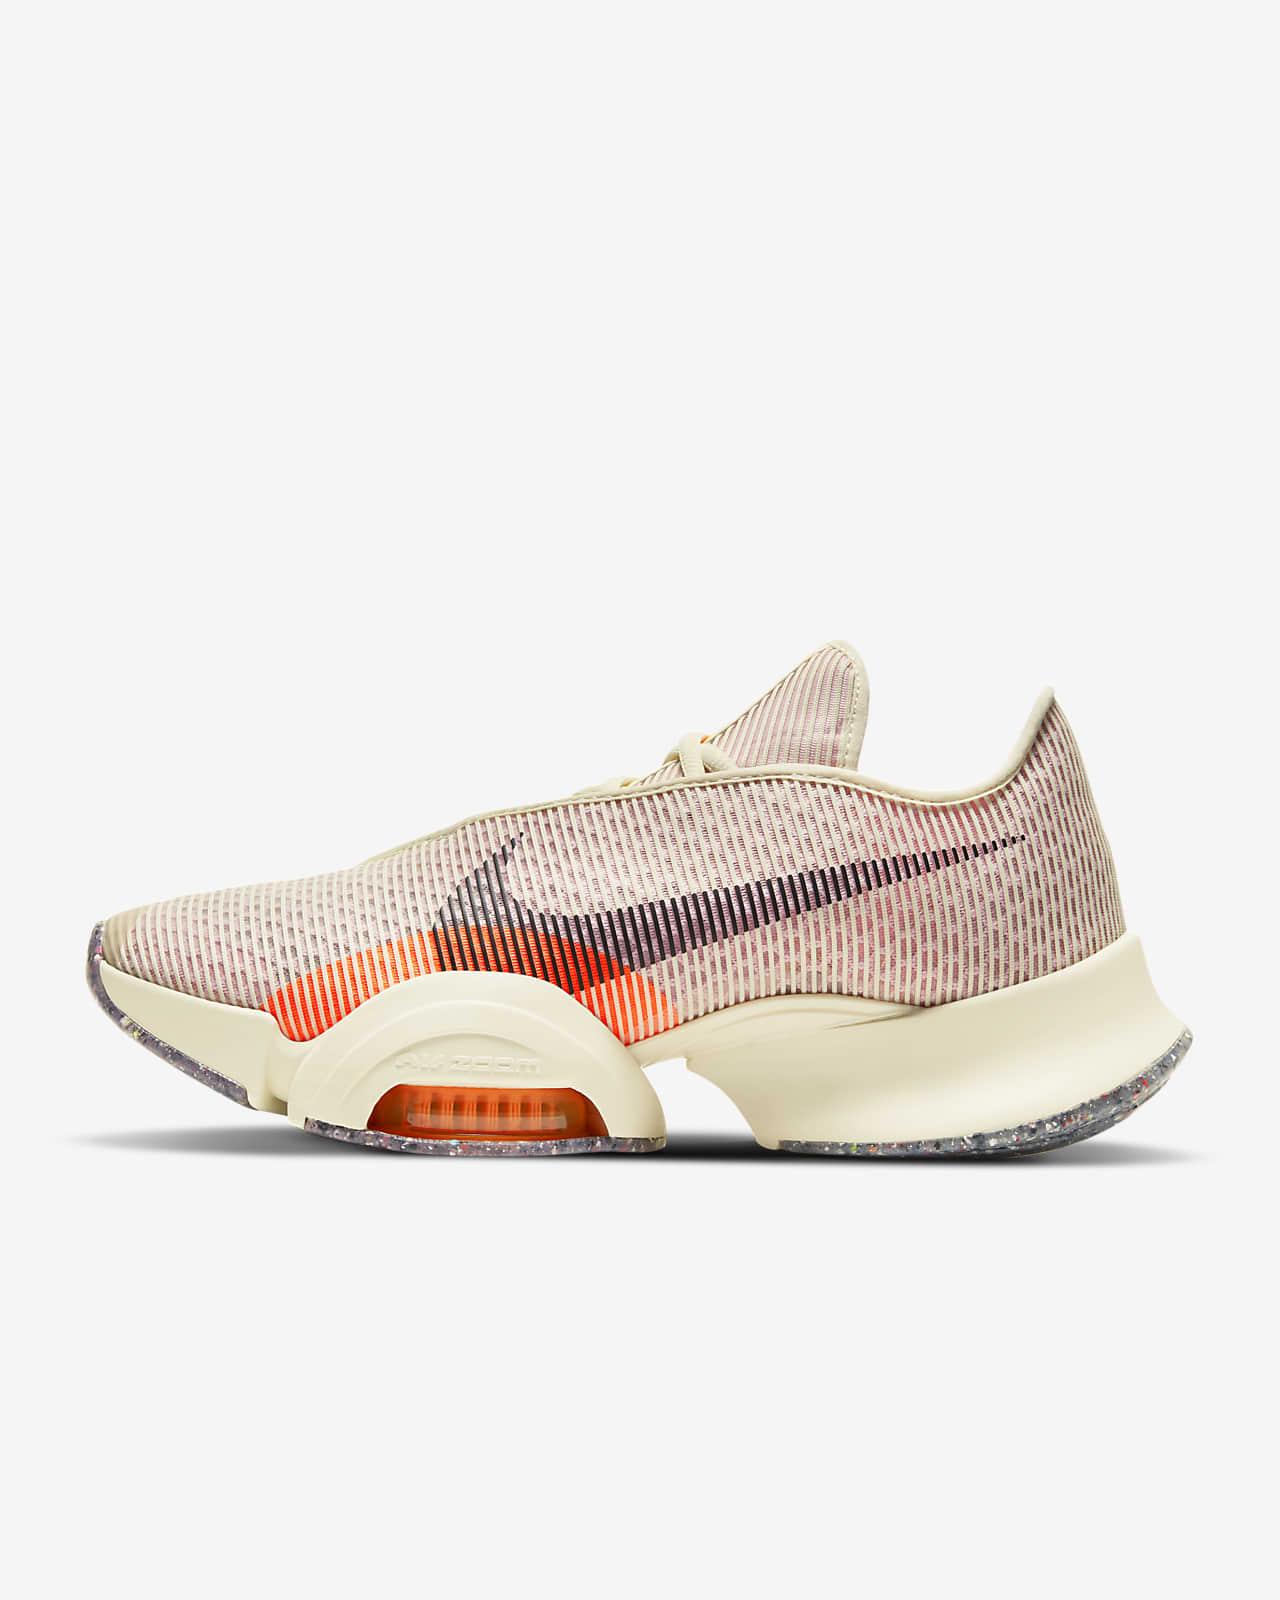 Nike Air Zoom SuperRep 2 Next Nature Zapatillas para clases de HIIT - Hombre